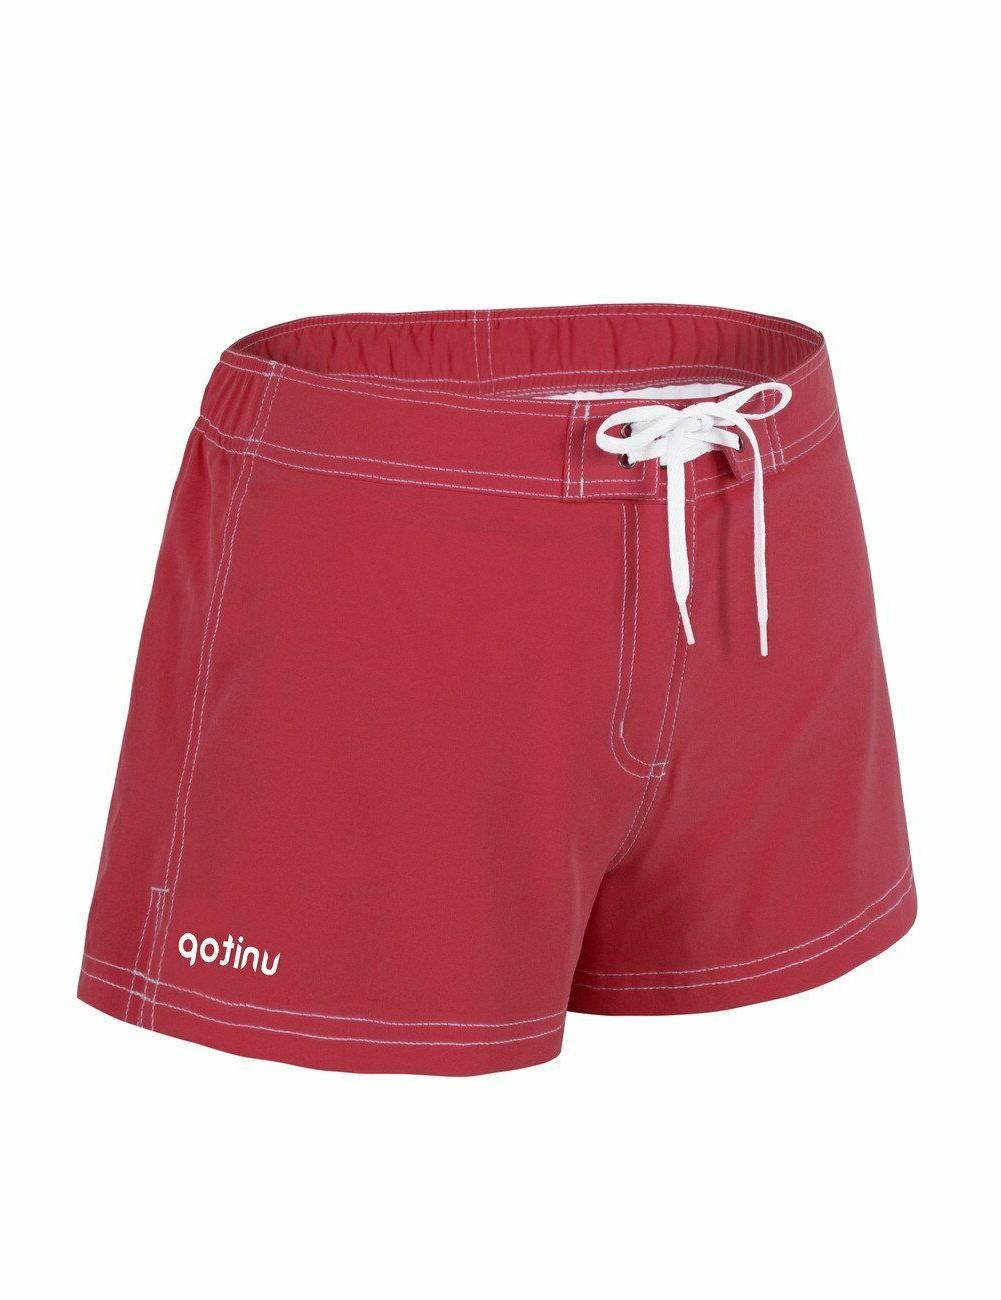 Unitop Women's Shorts Beach Swim Bottoms Quick Dry